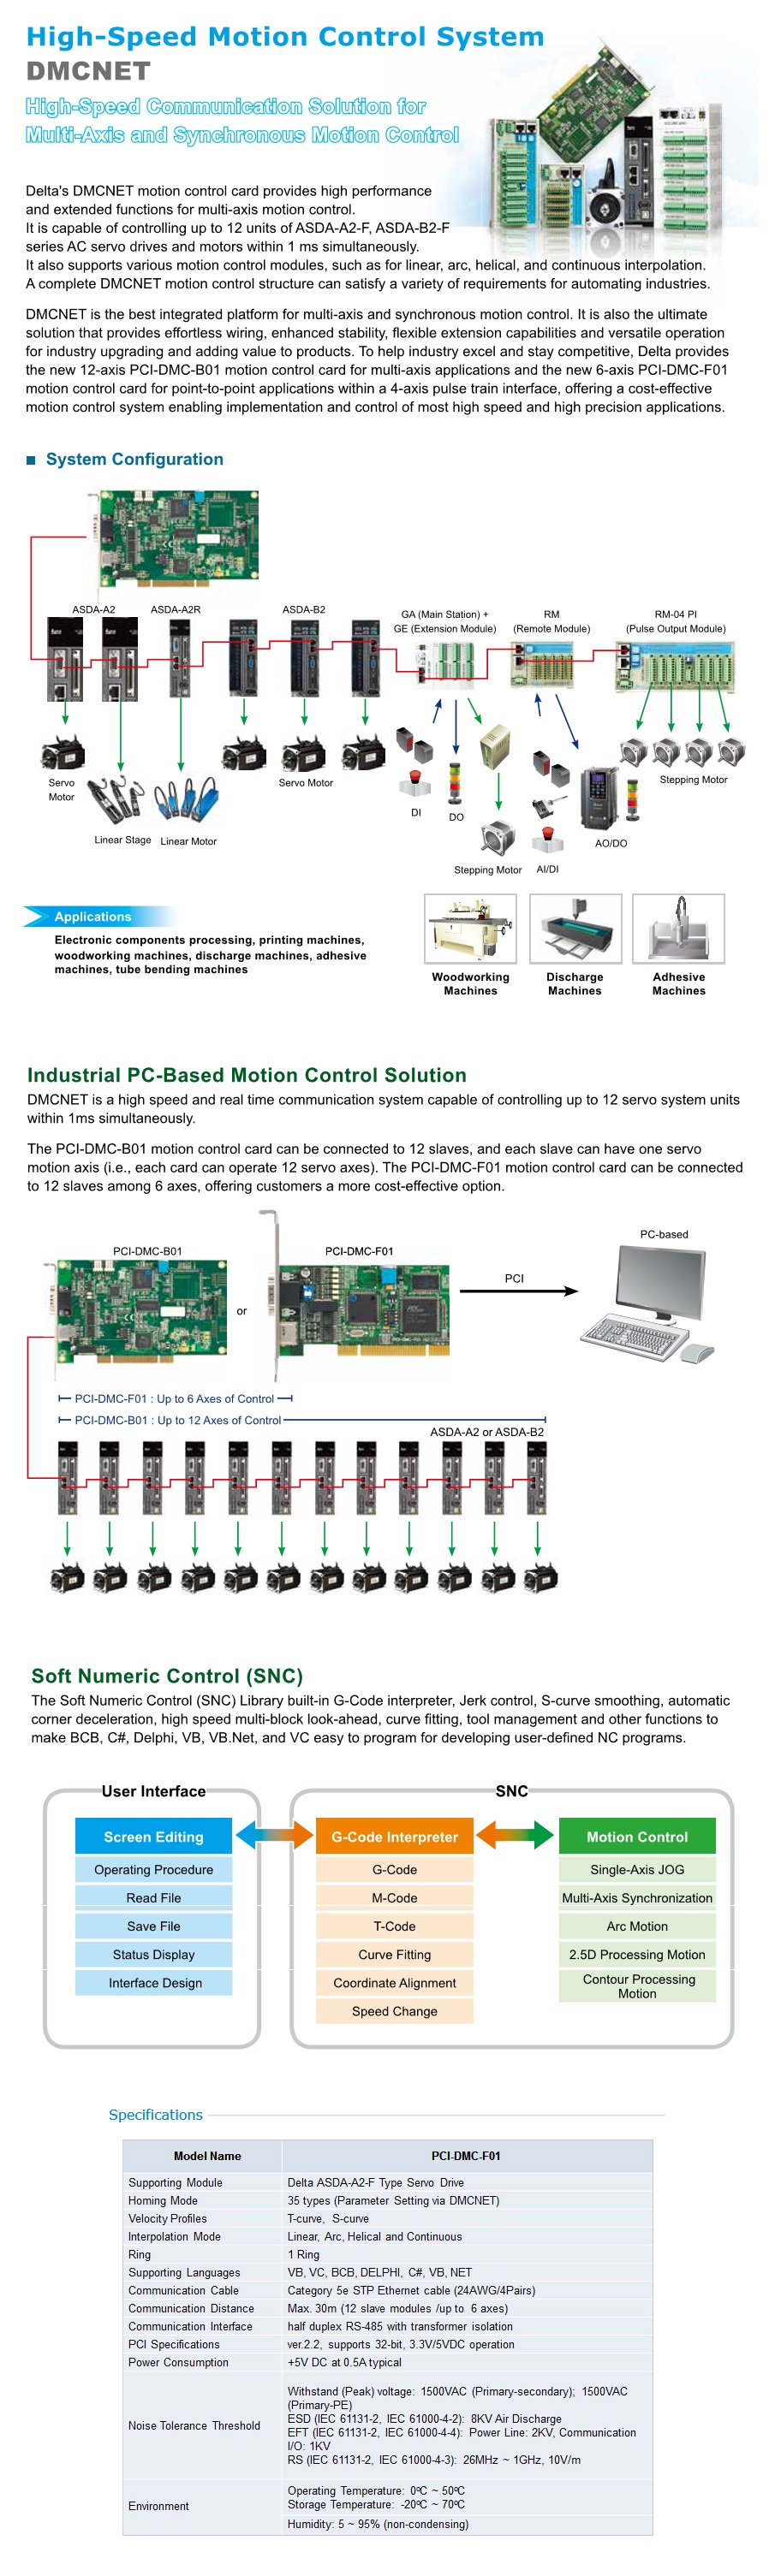 Helical Interpolation Macro Image Mag